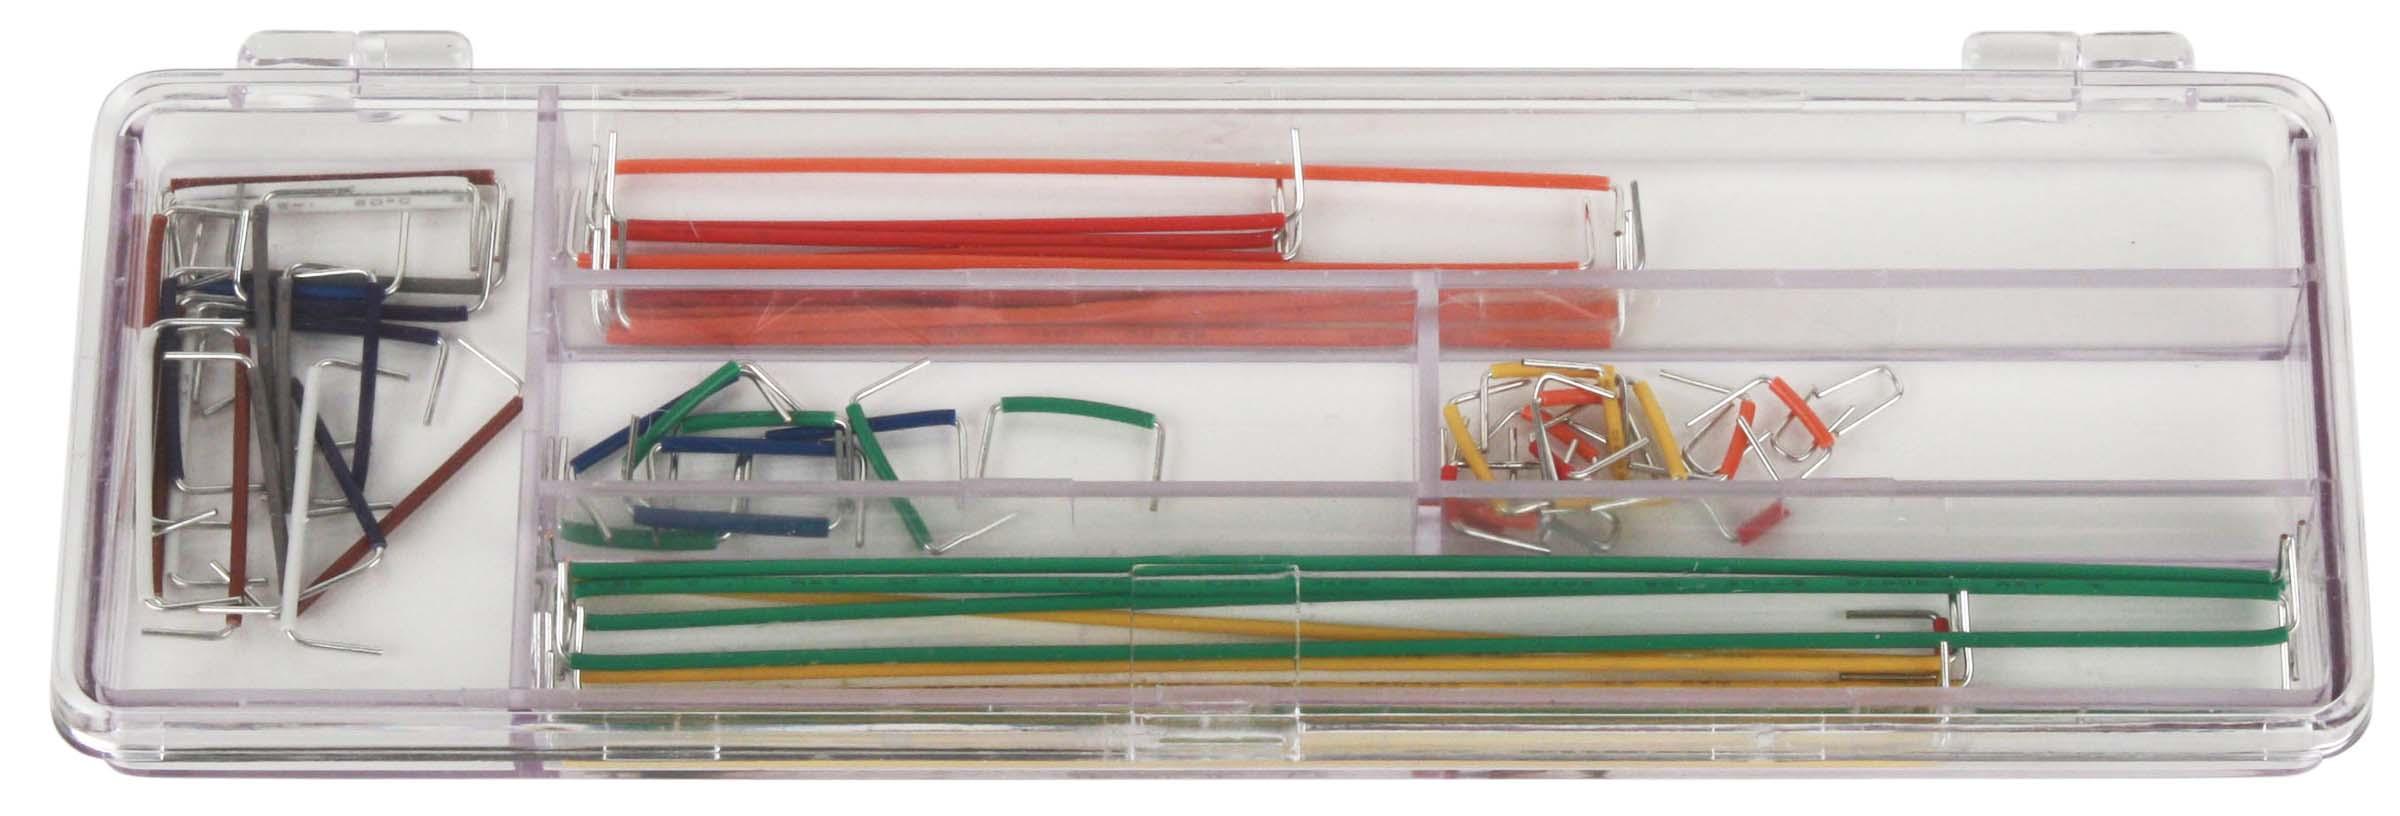 Global Specialties WK-3 Jumper Wire Kit, 70 Pcs Photo